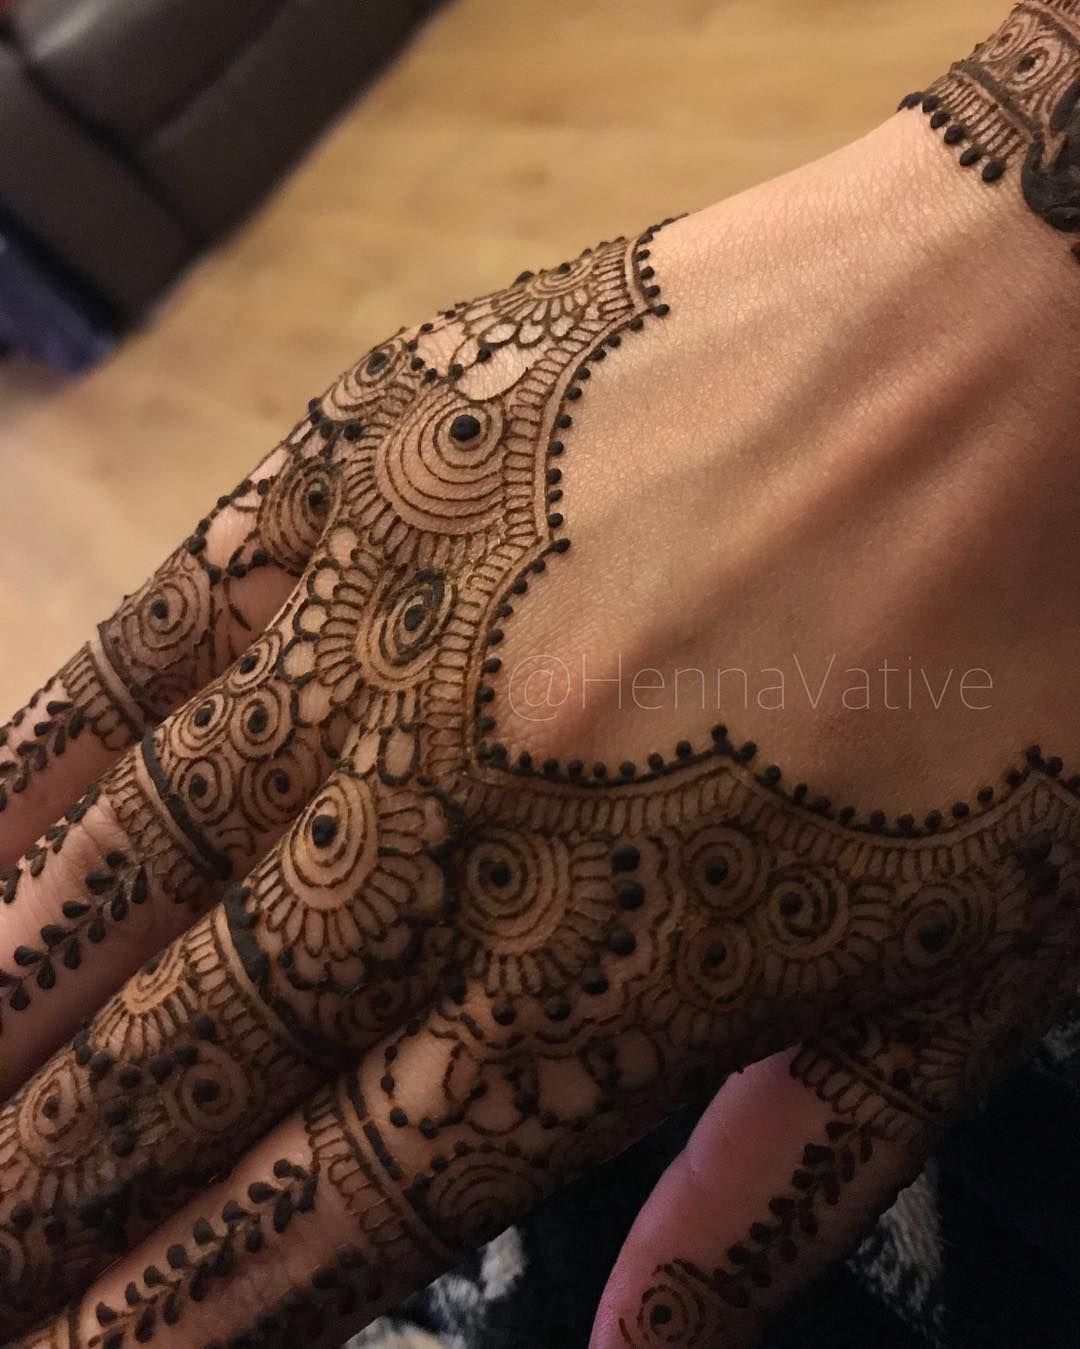 Name tattoo good idea closeeeee up  henna tattoos  pinterest  hennas and tattoo